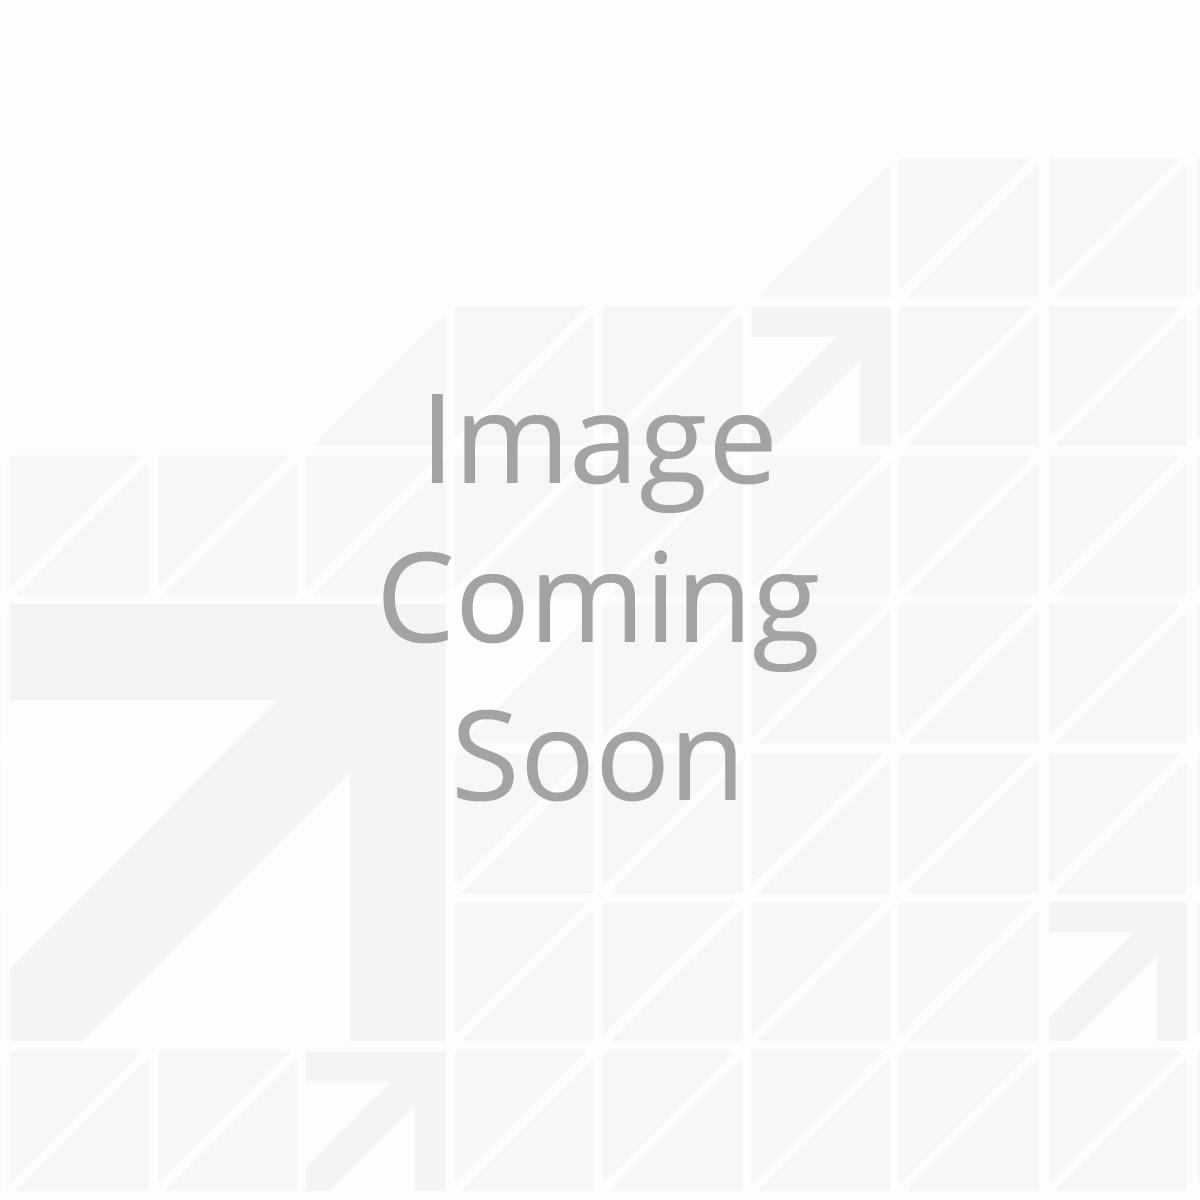 Jack, 12K Spring Return - 16 TS, 15WS (500385TH)